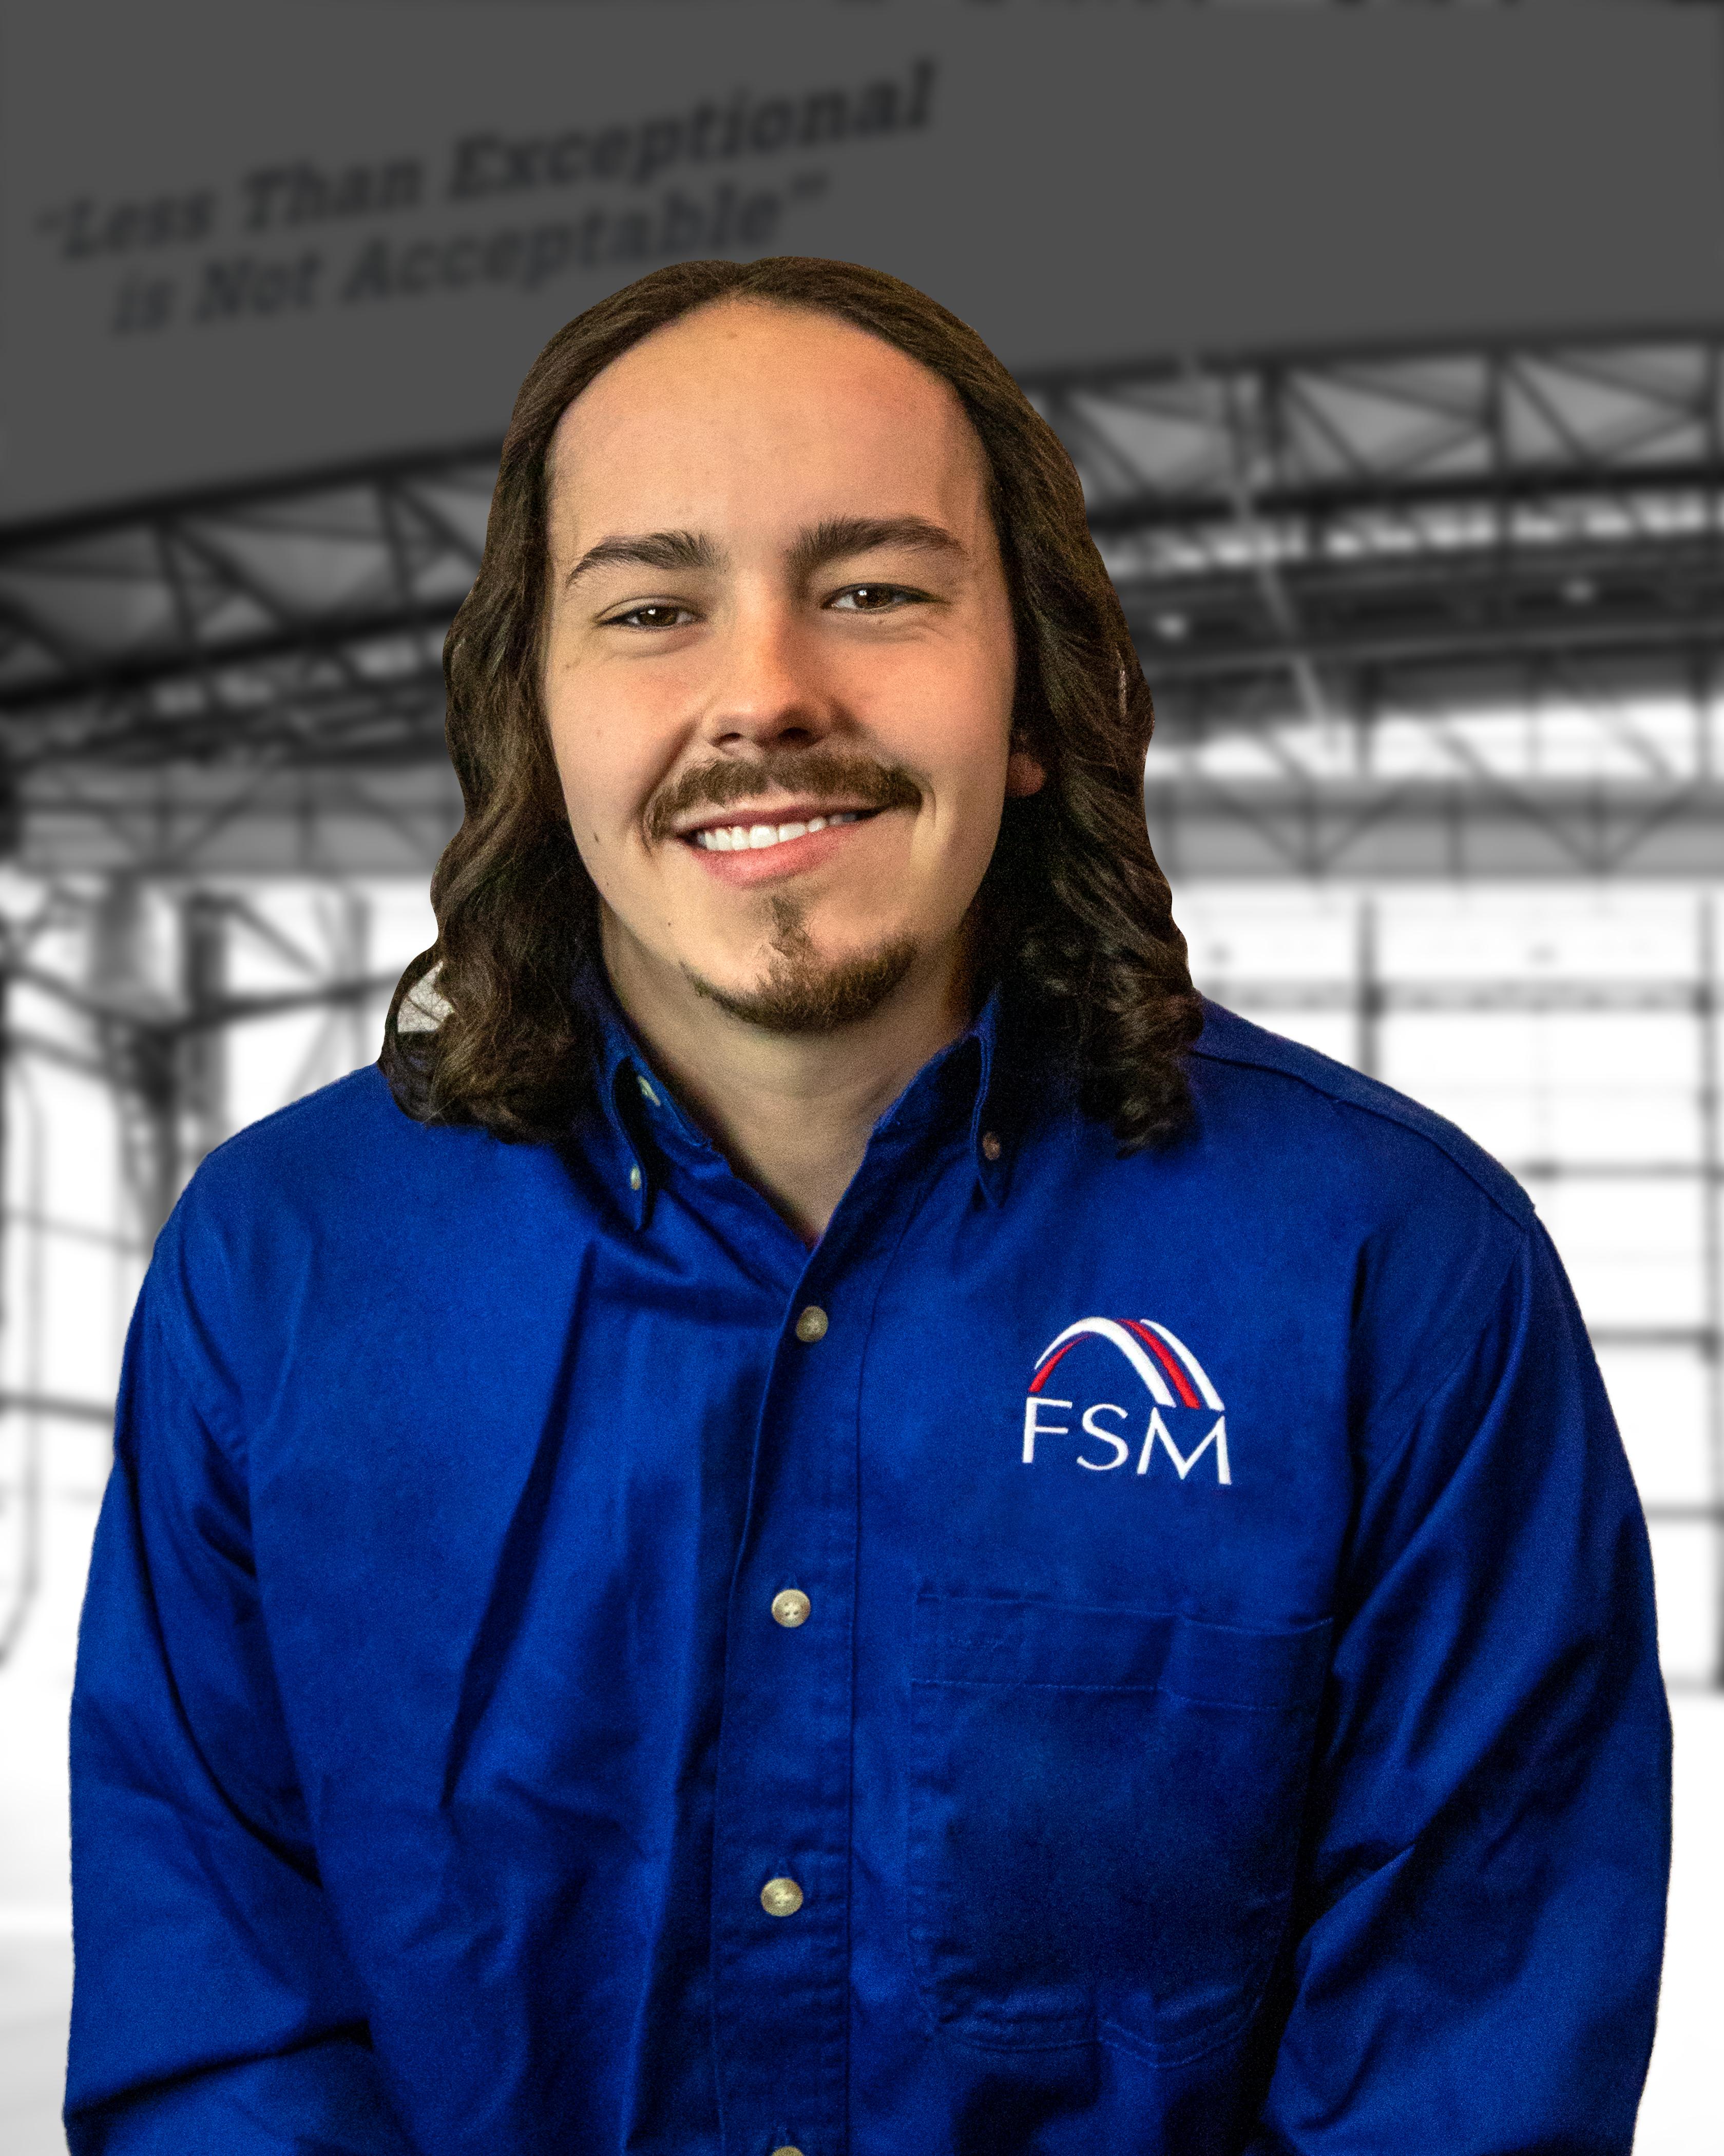 FSM Brendan Gubbini Foreman